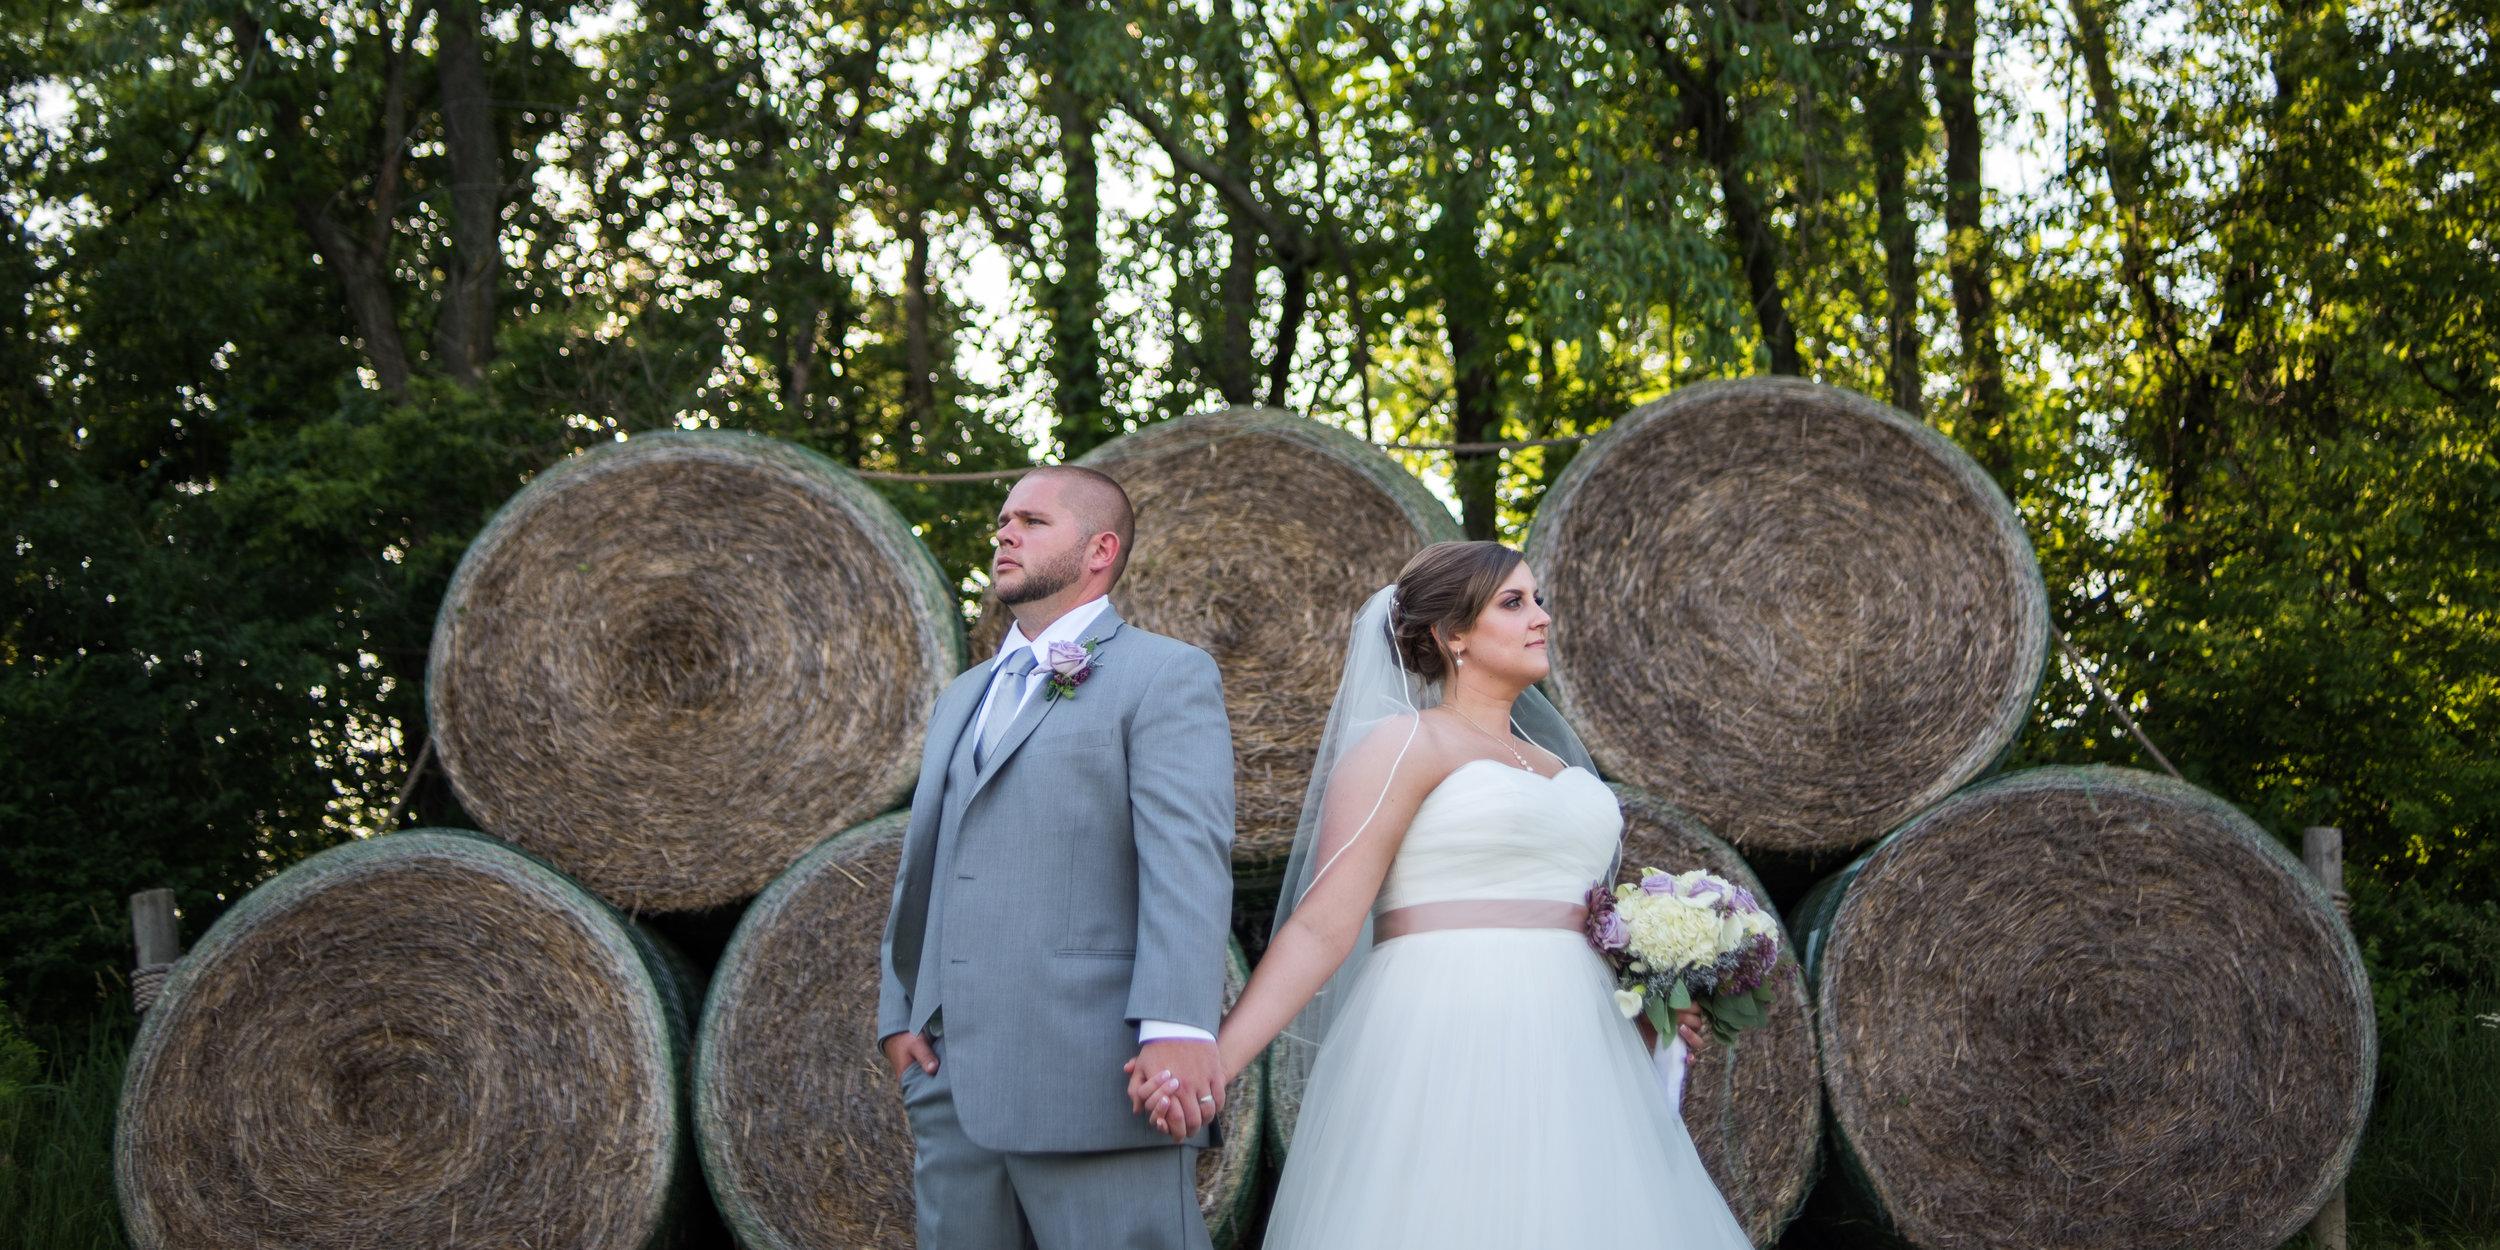 BRITTNEY+PAUL WEDDING PREVIEWS